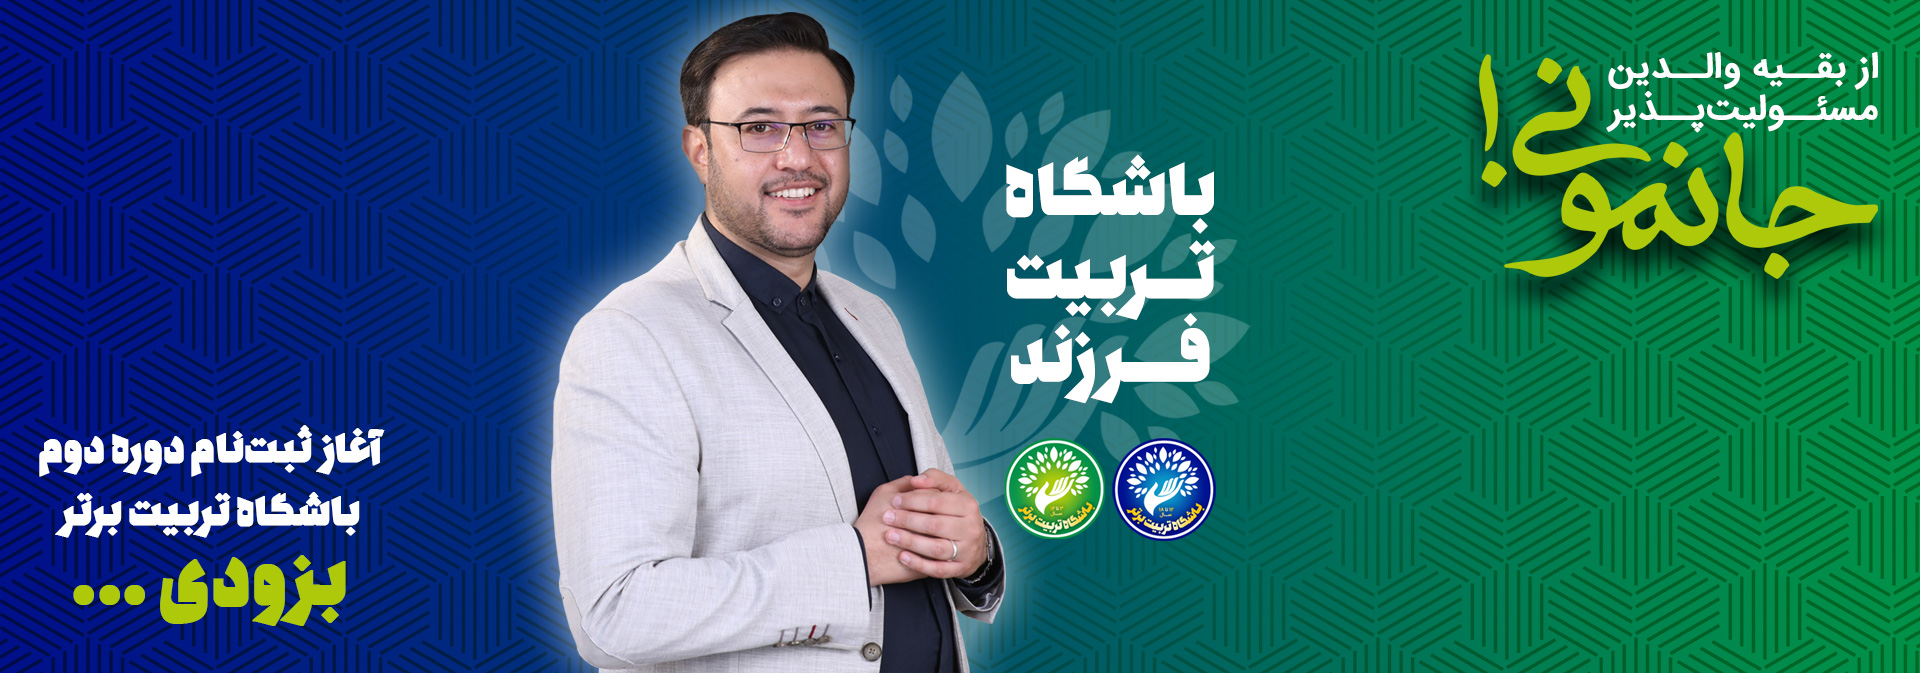 Banner Tarbiat Bartar Homepage